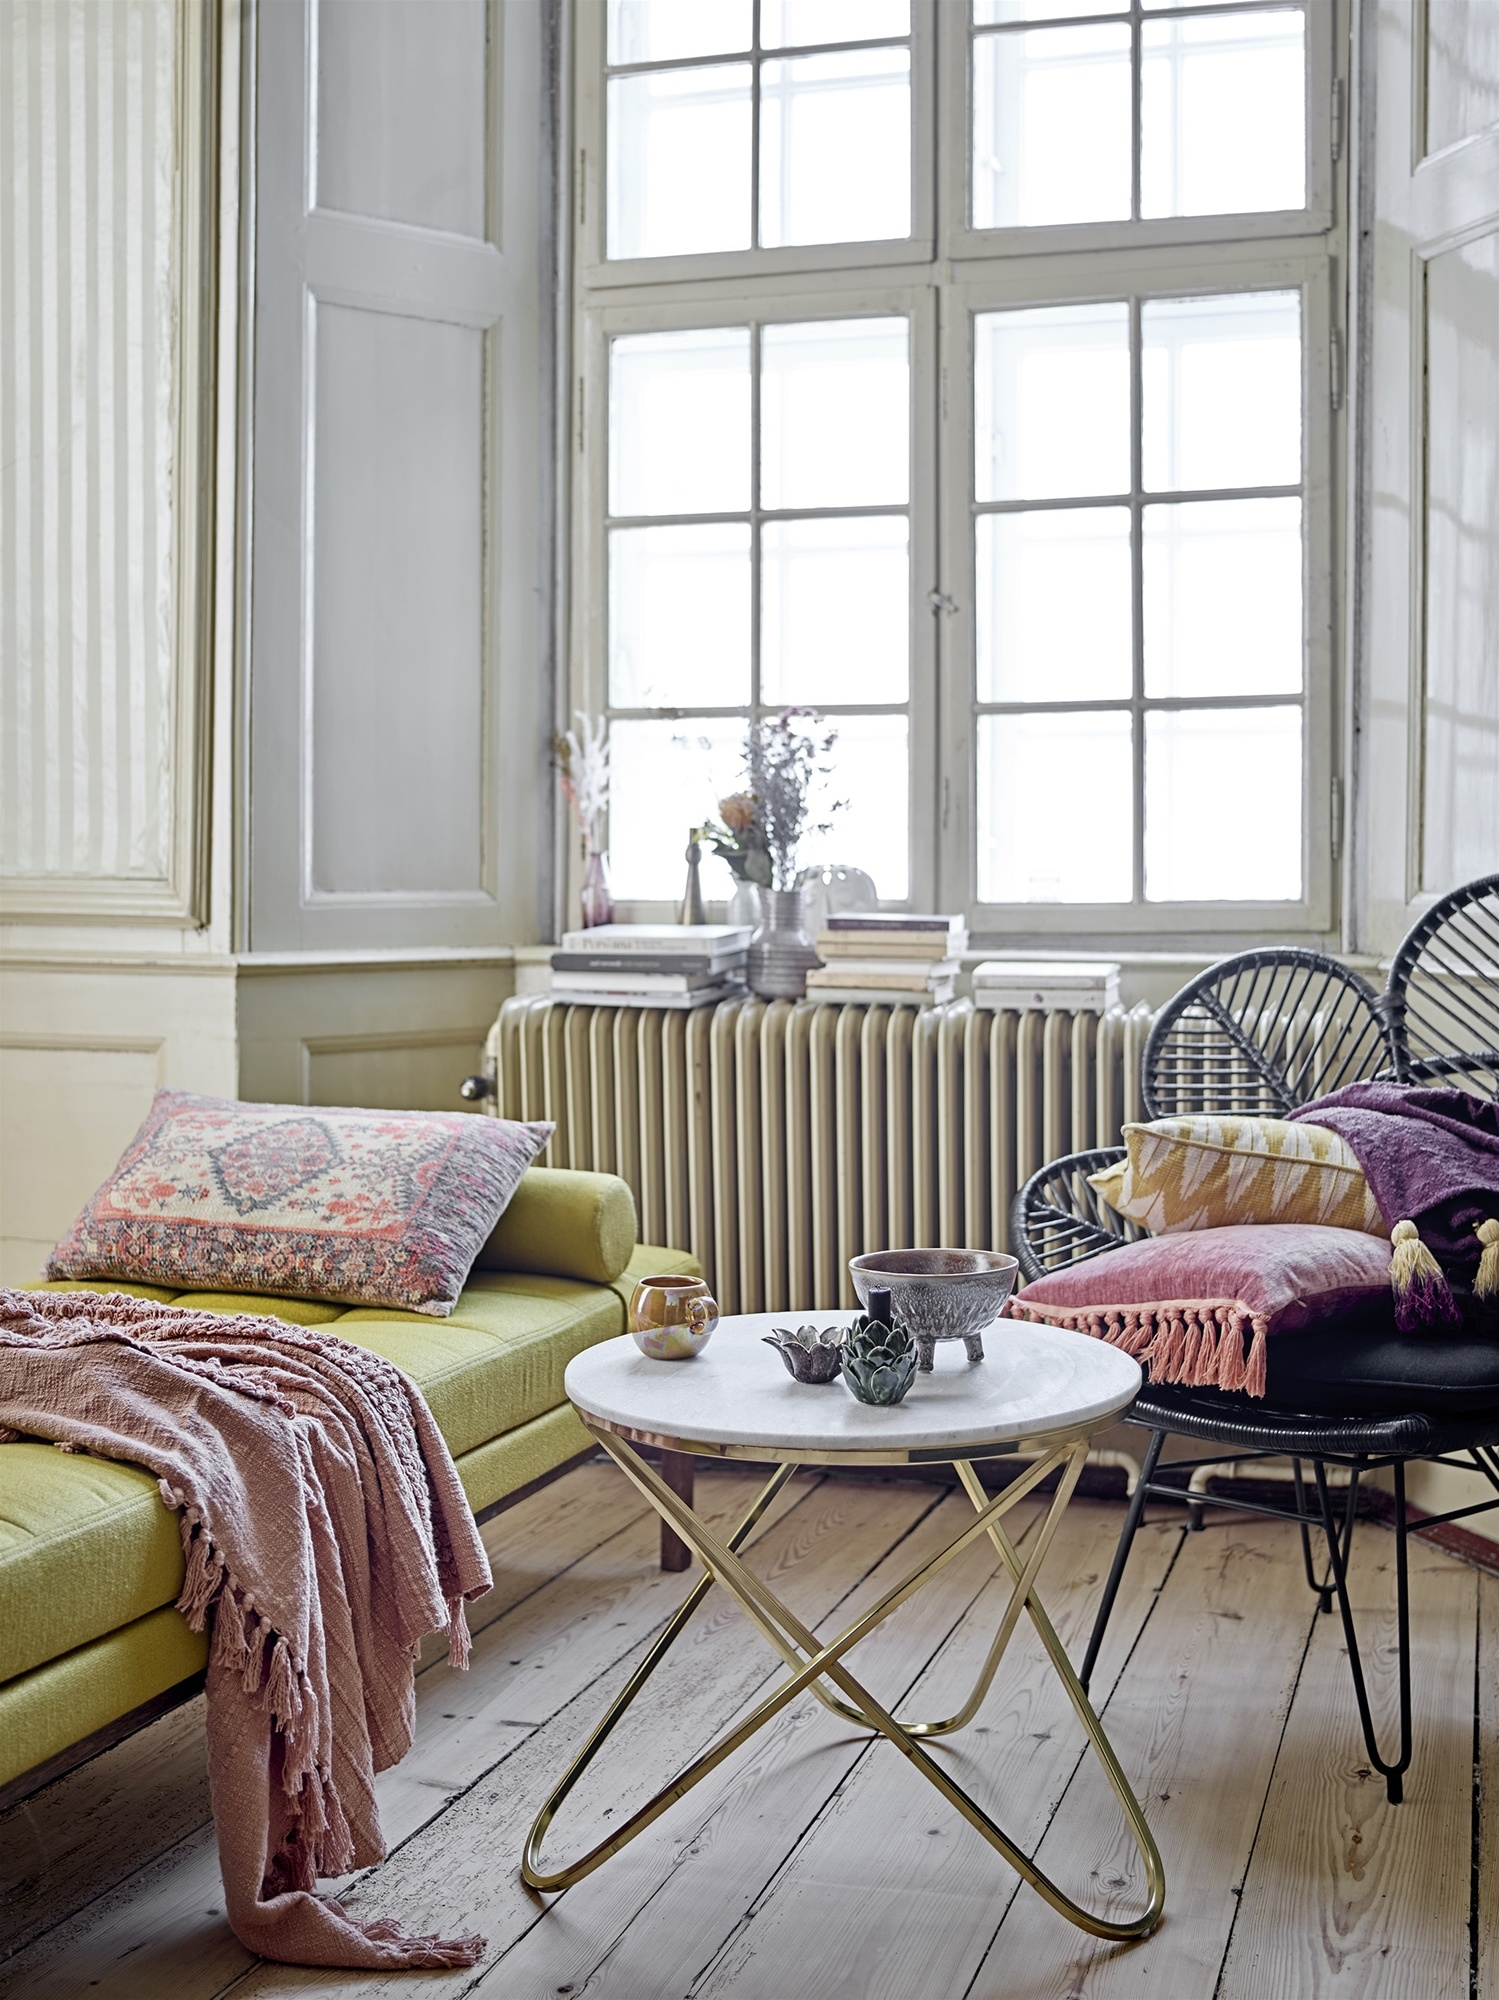 Bloomingville Cushion - Pink - 45x45cm - Bloomingville